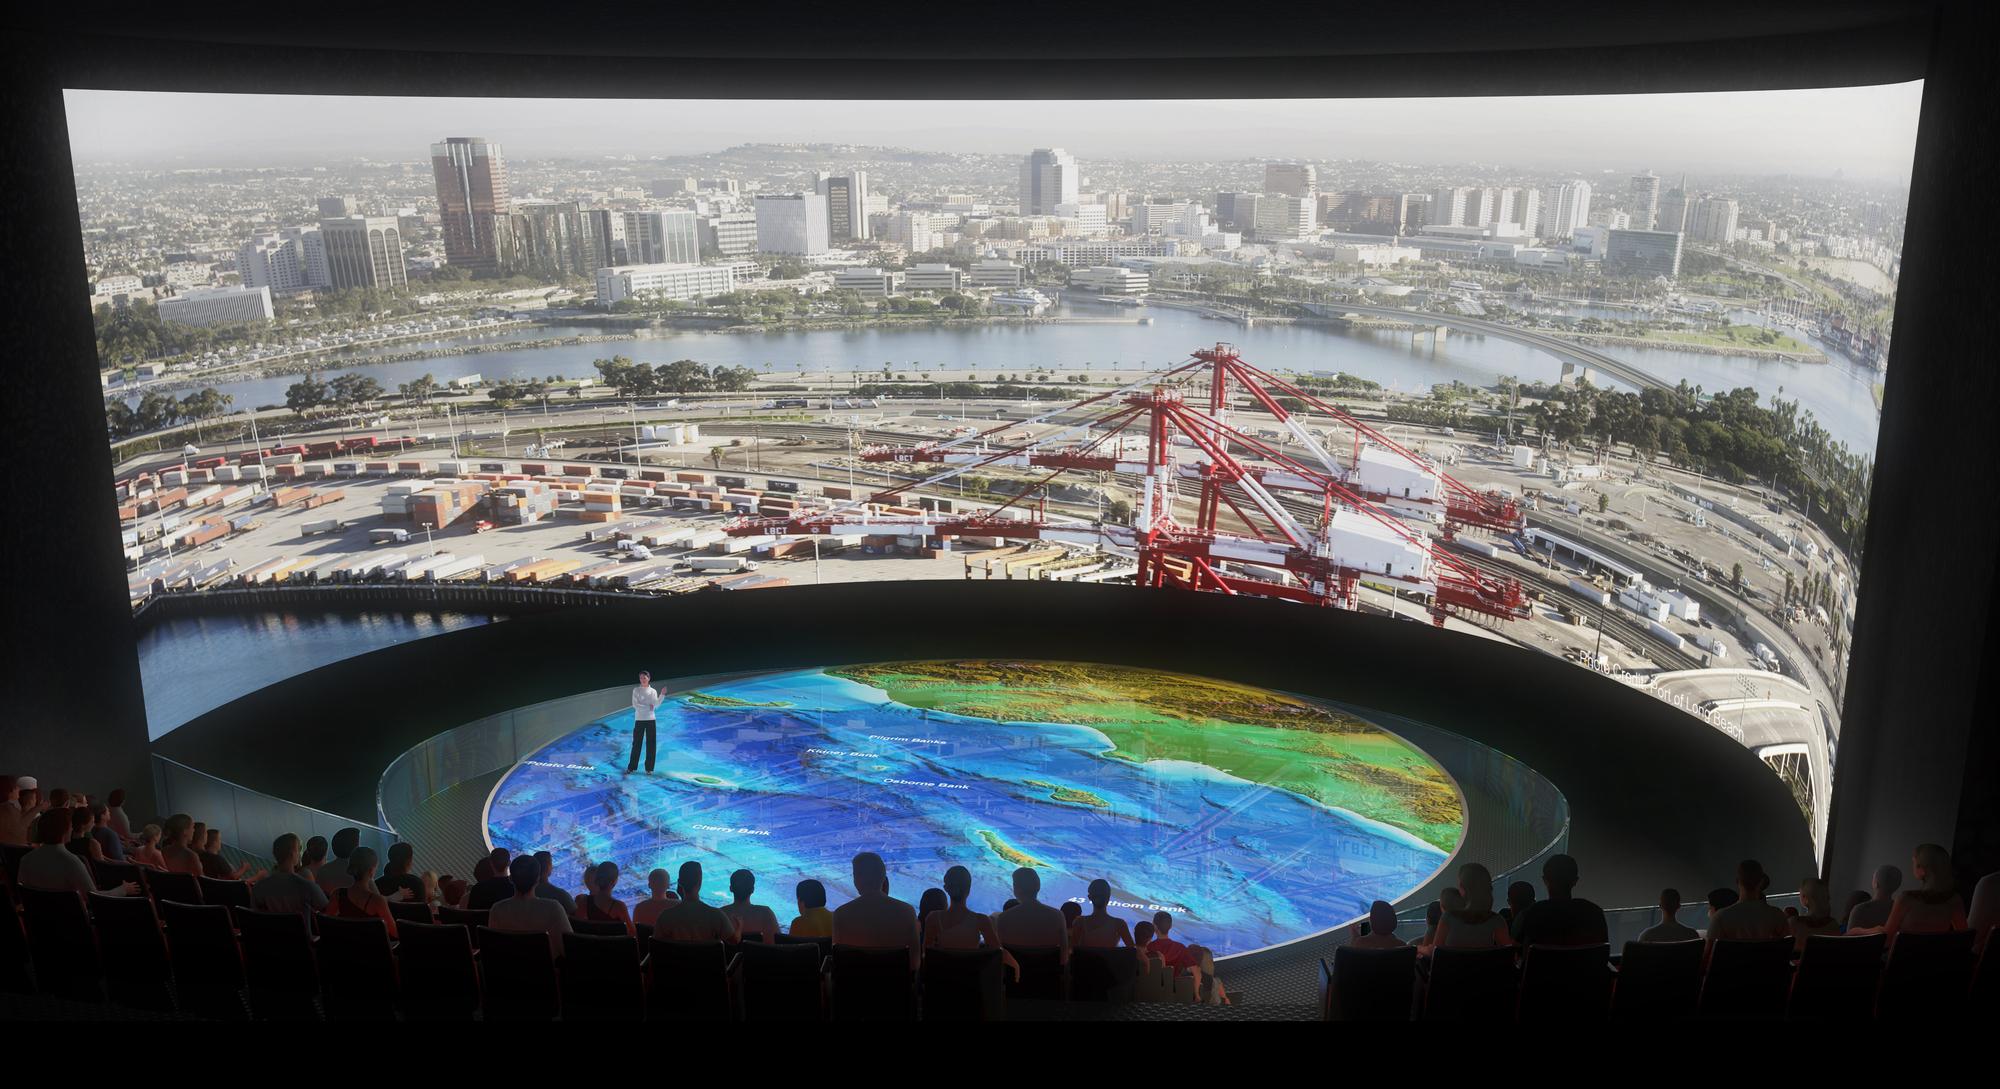 Gallery Of Aquarium Of The Pacific Reveals New Design For